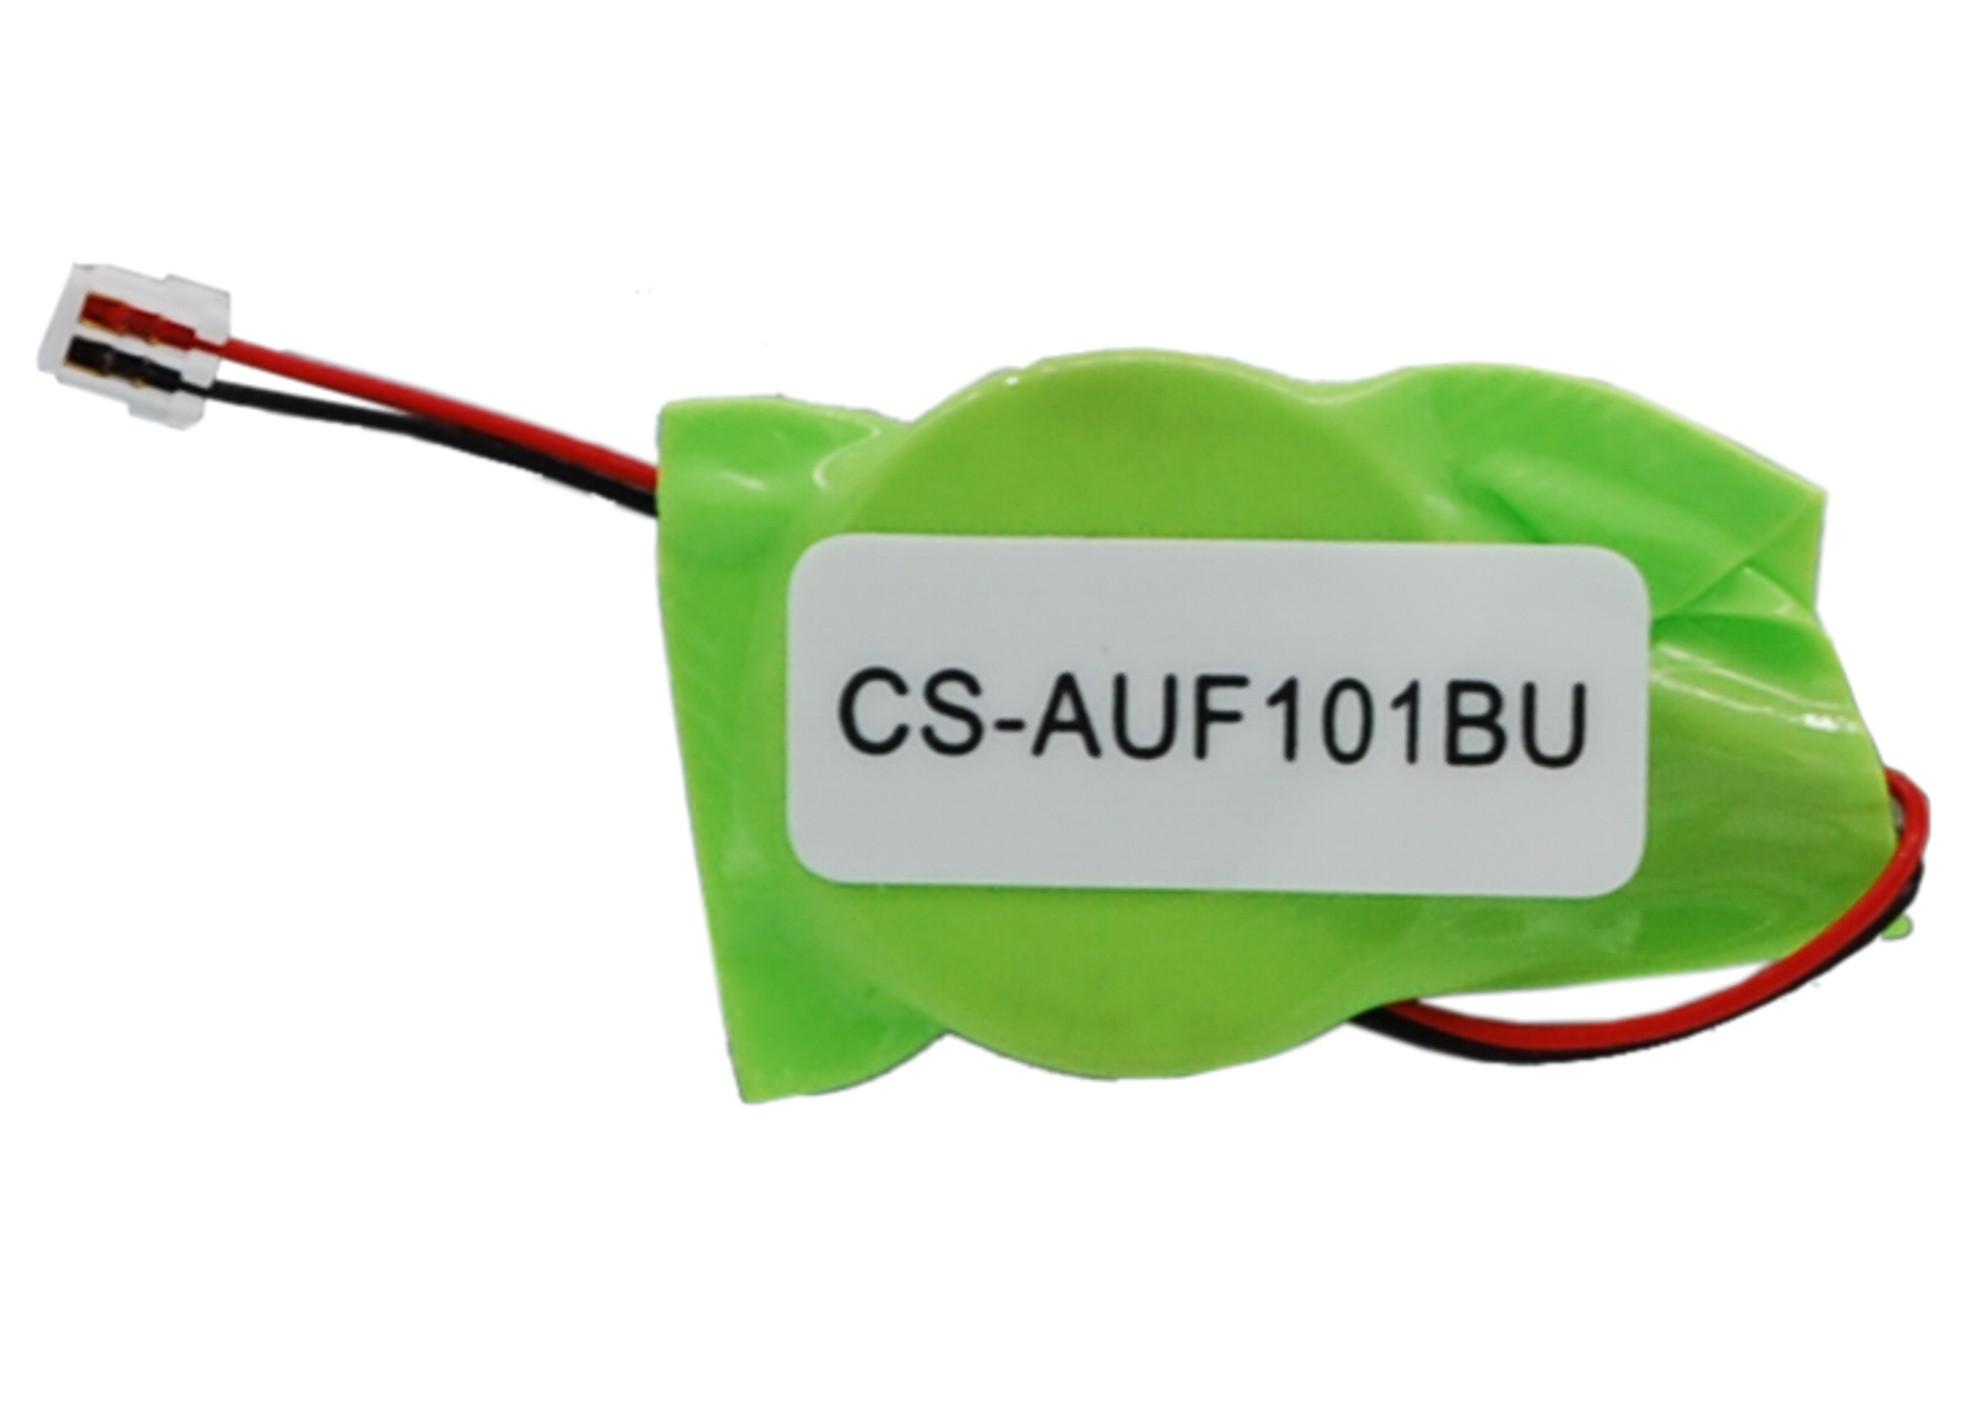 Cameron Sino baterie cmos pro ASUS Eee Transformer TF101 3V Li-ion 40mAh zelená - neoriginální